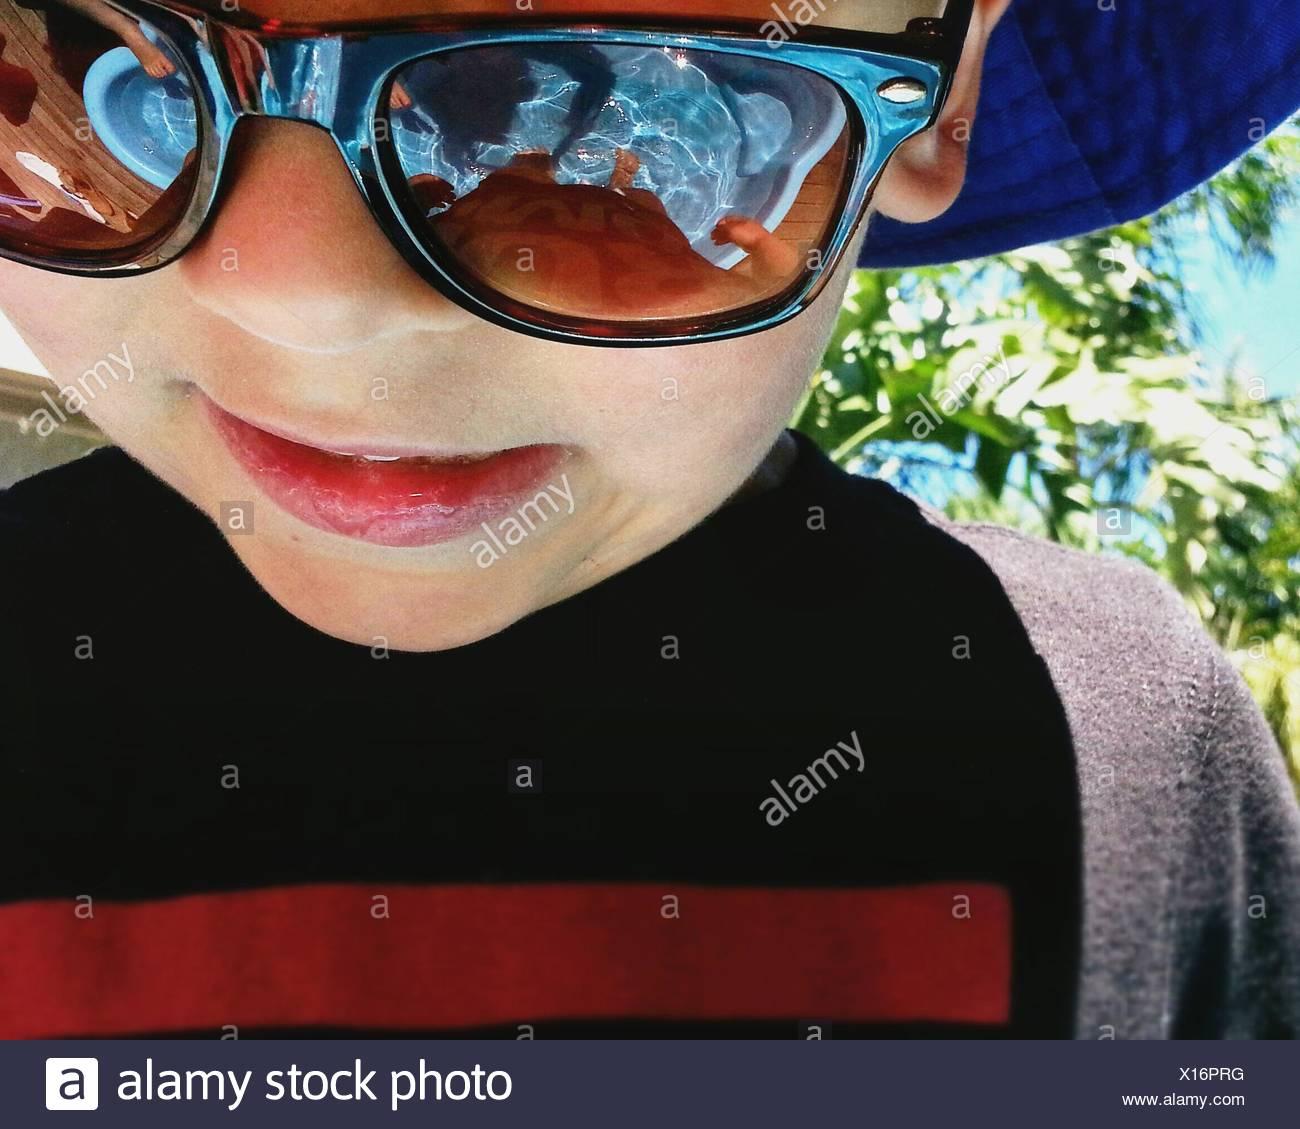 Portrait of a boy wearing sunglasses - Stock Image